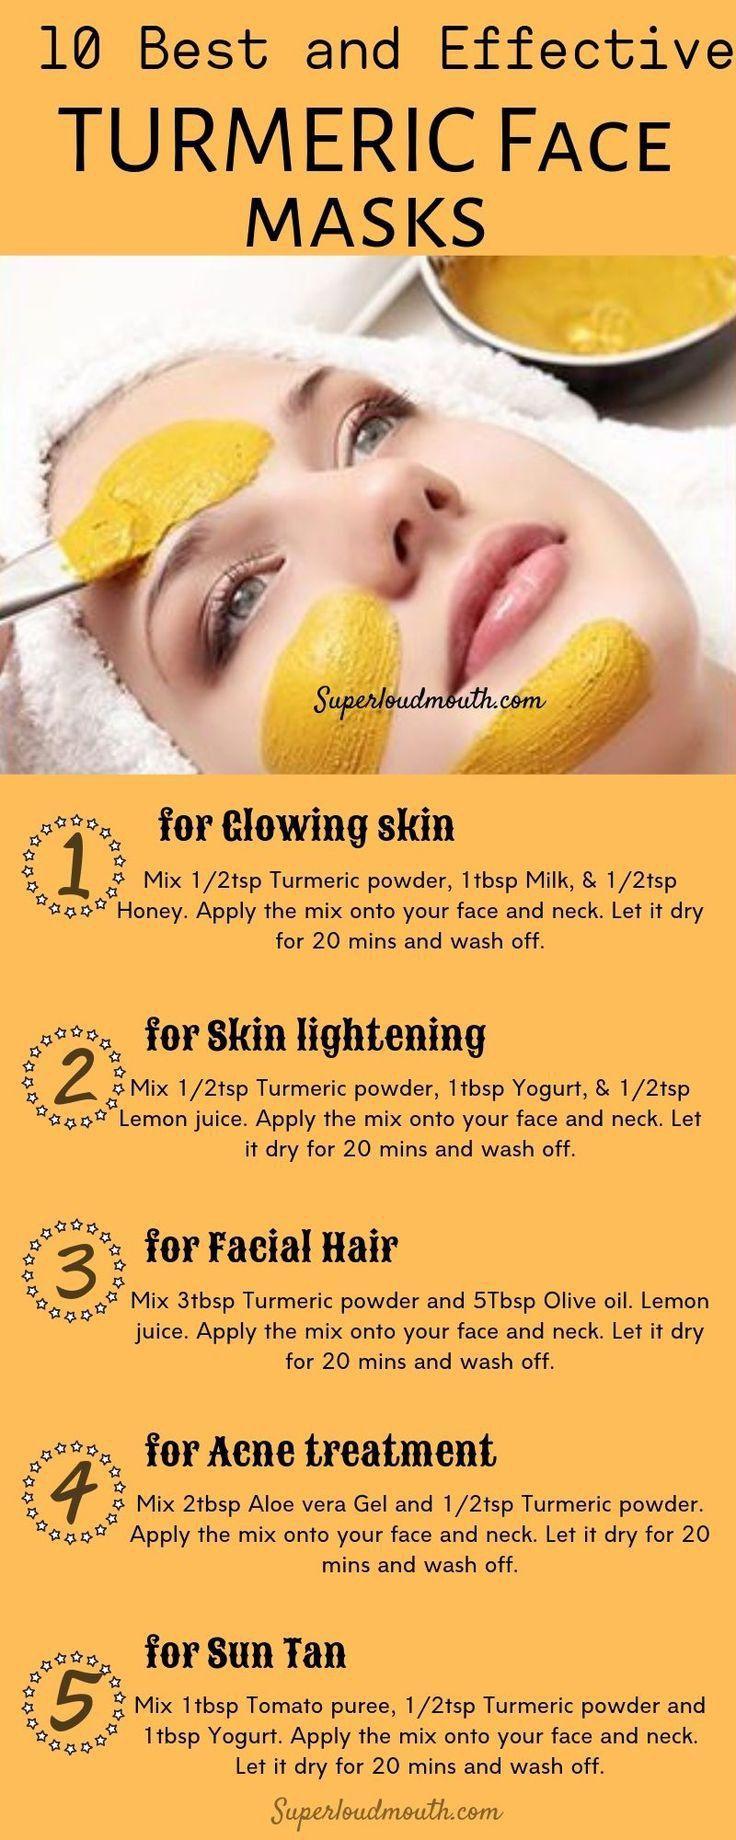 Top 12 beauty tips in 12  Diy turmeric face mask, Skin face mask